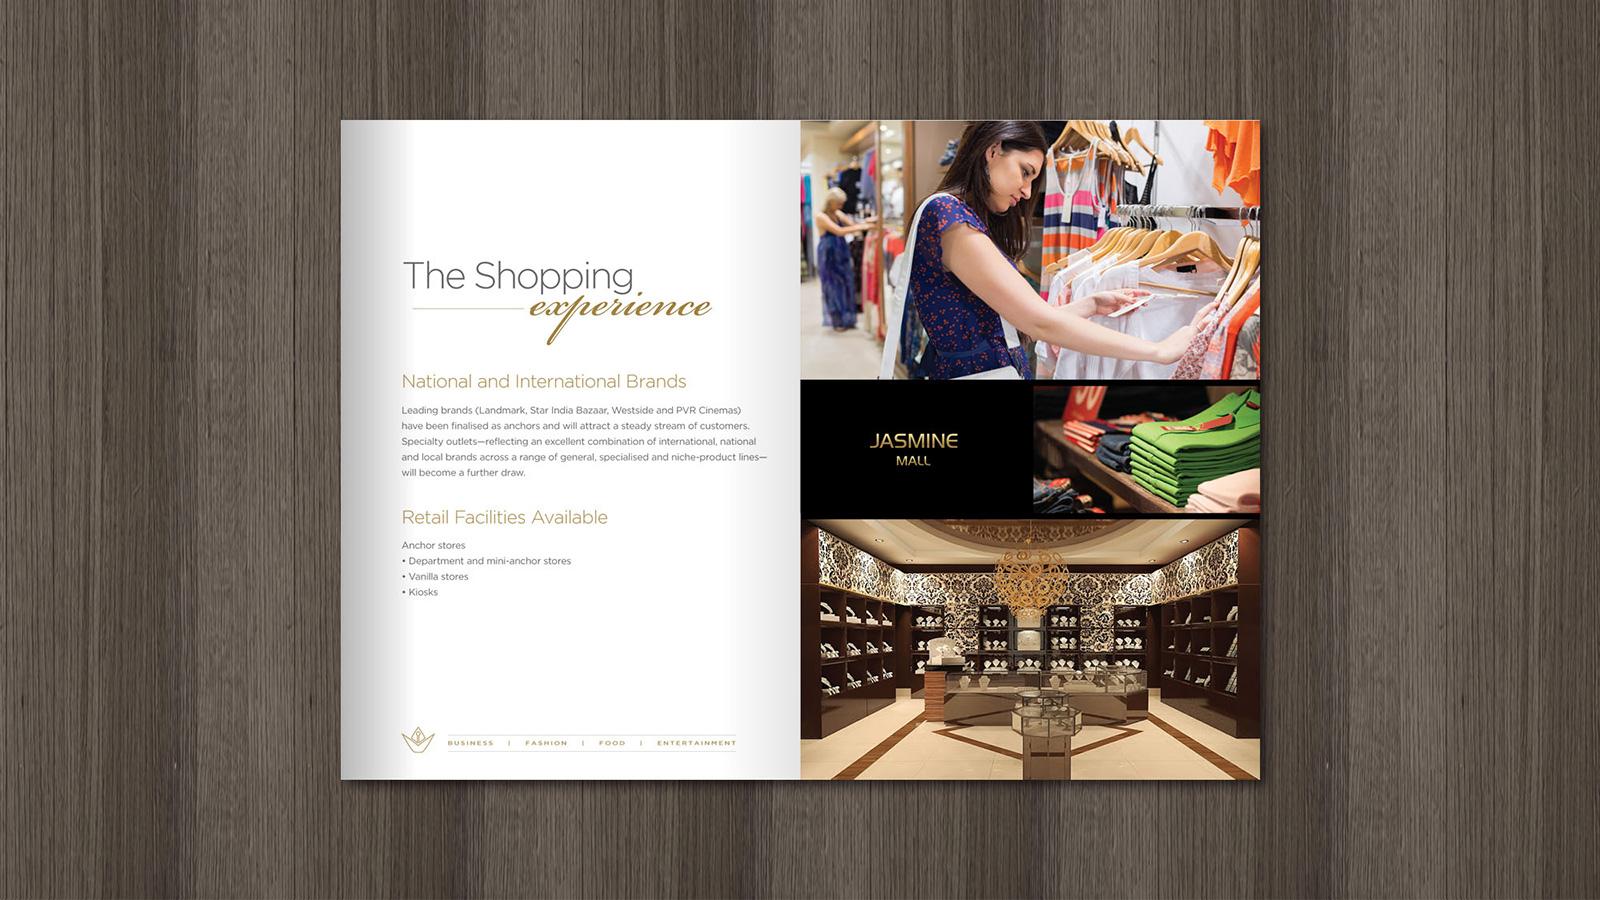 graphic-brand-design-web-designer-hiline-lahore-pakistan-jasmine-mall-012